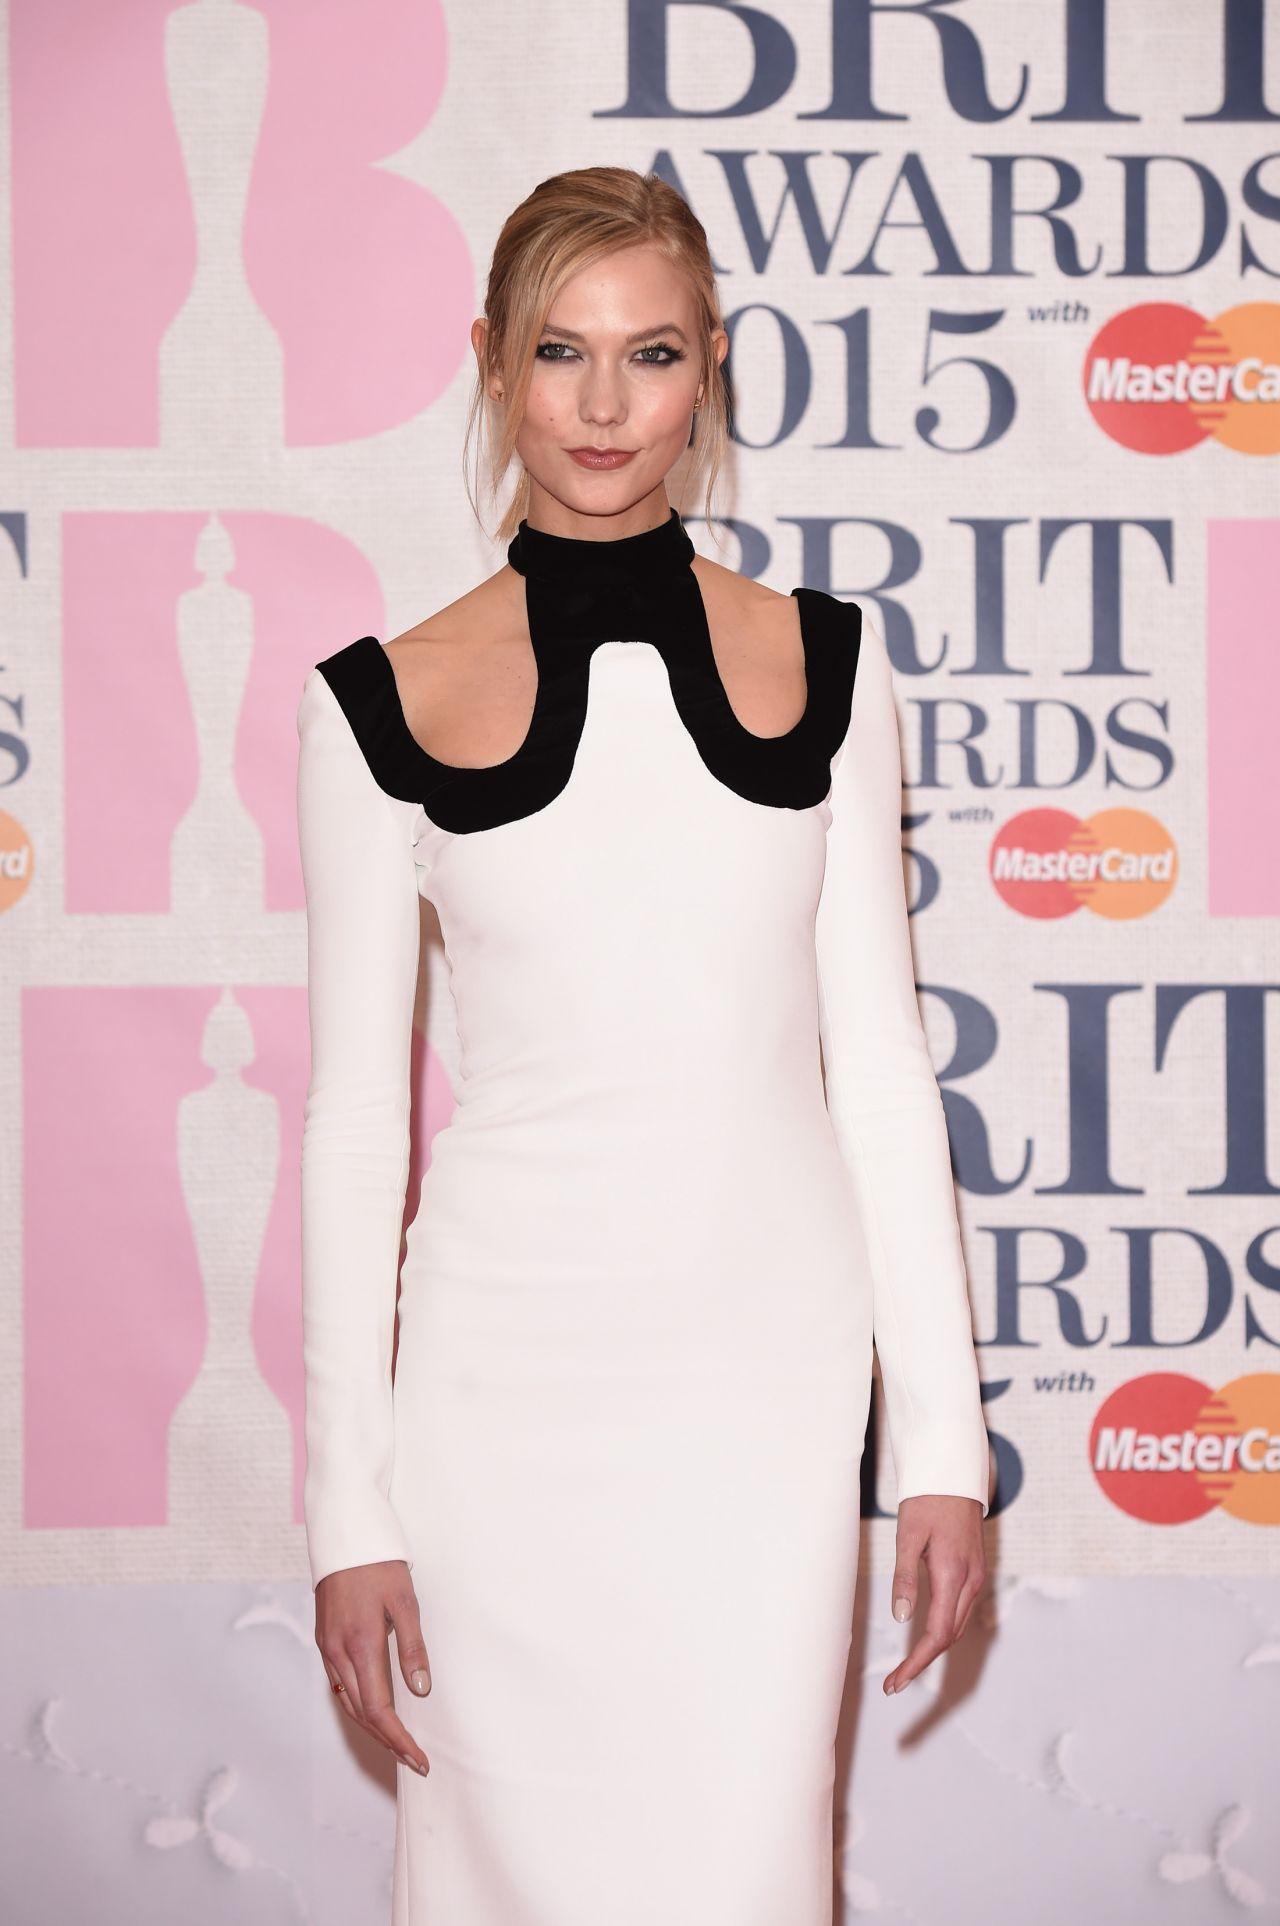 karlie-kloss-tom-ford-2015-brit-awards_1